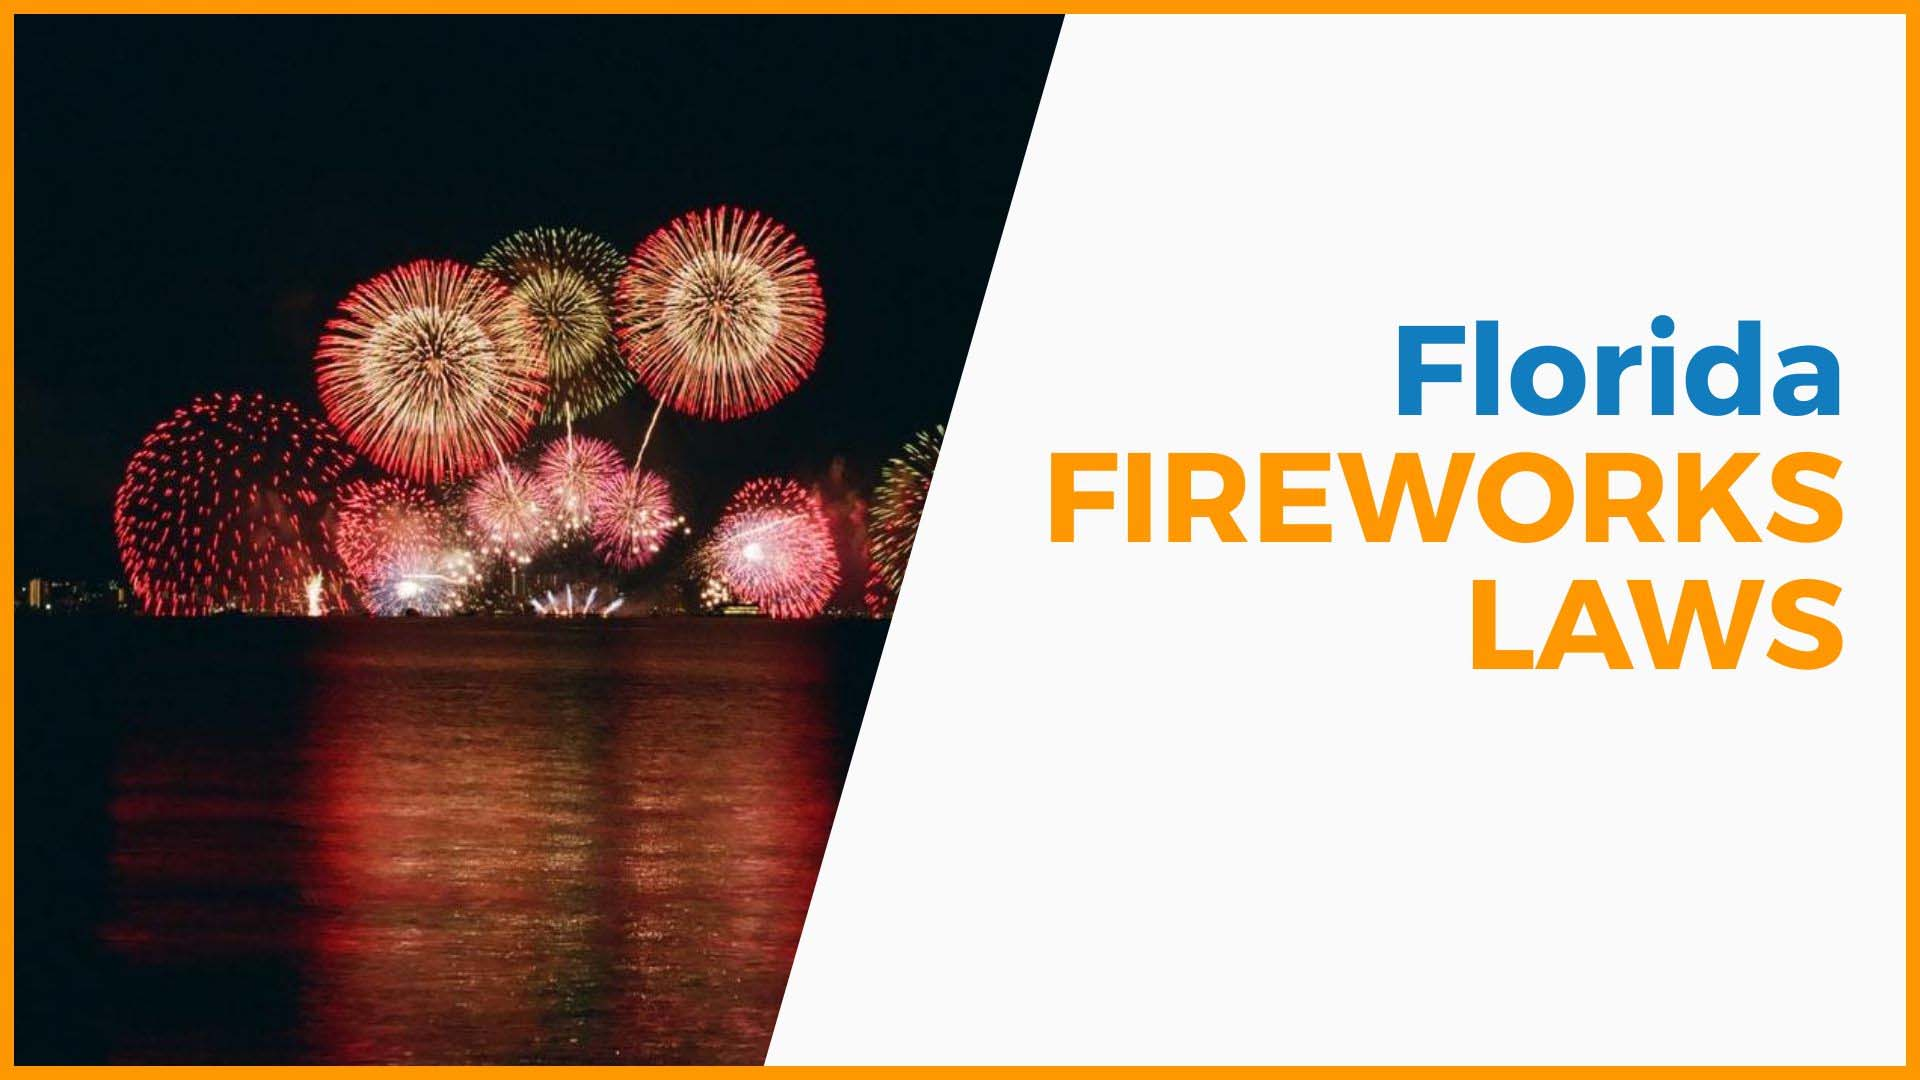 Florida Fireworks Laws